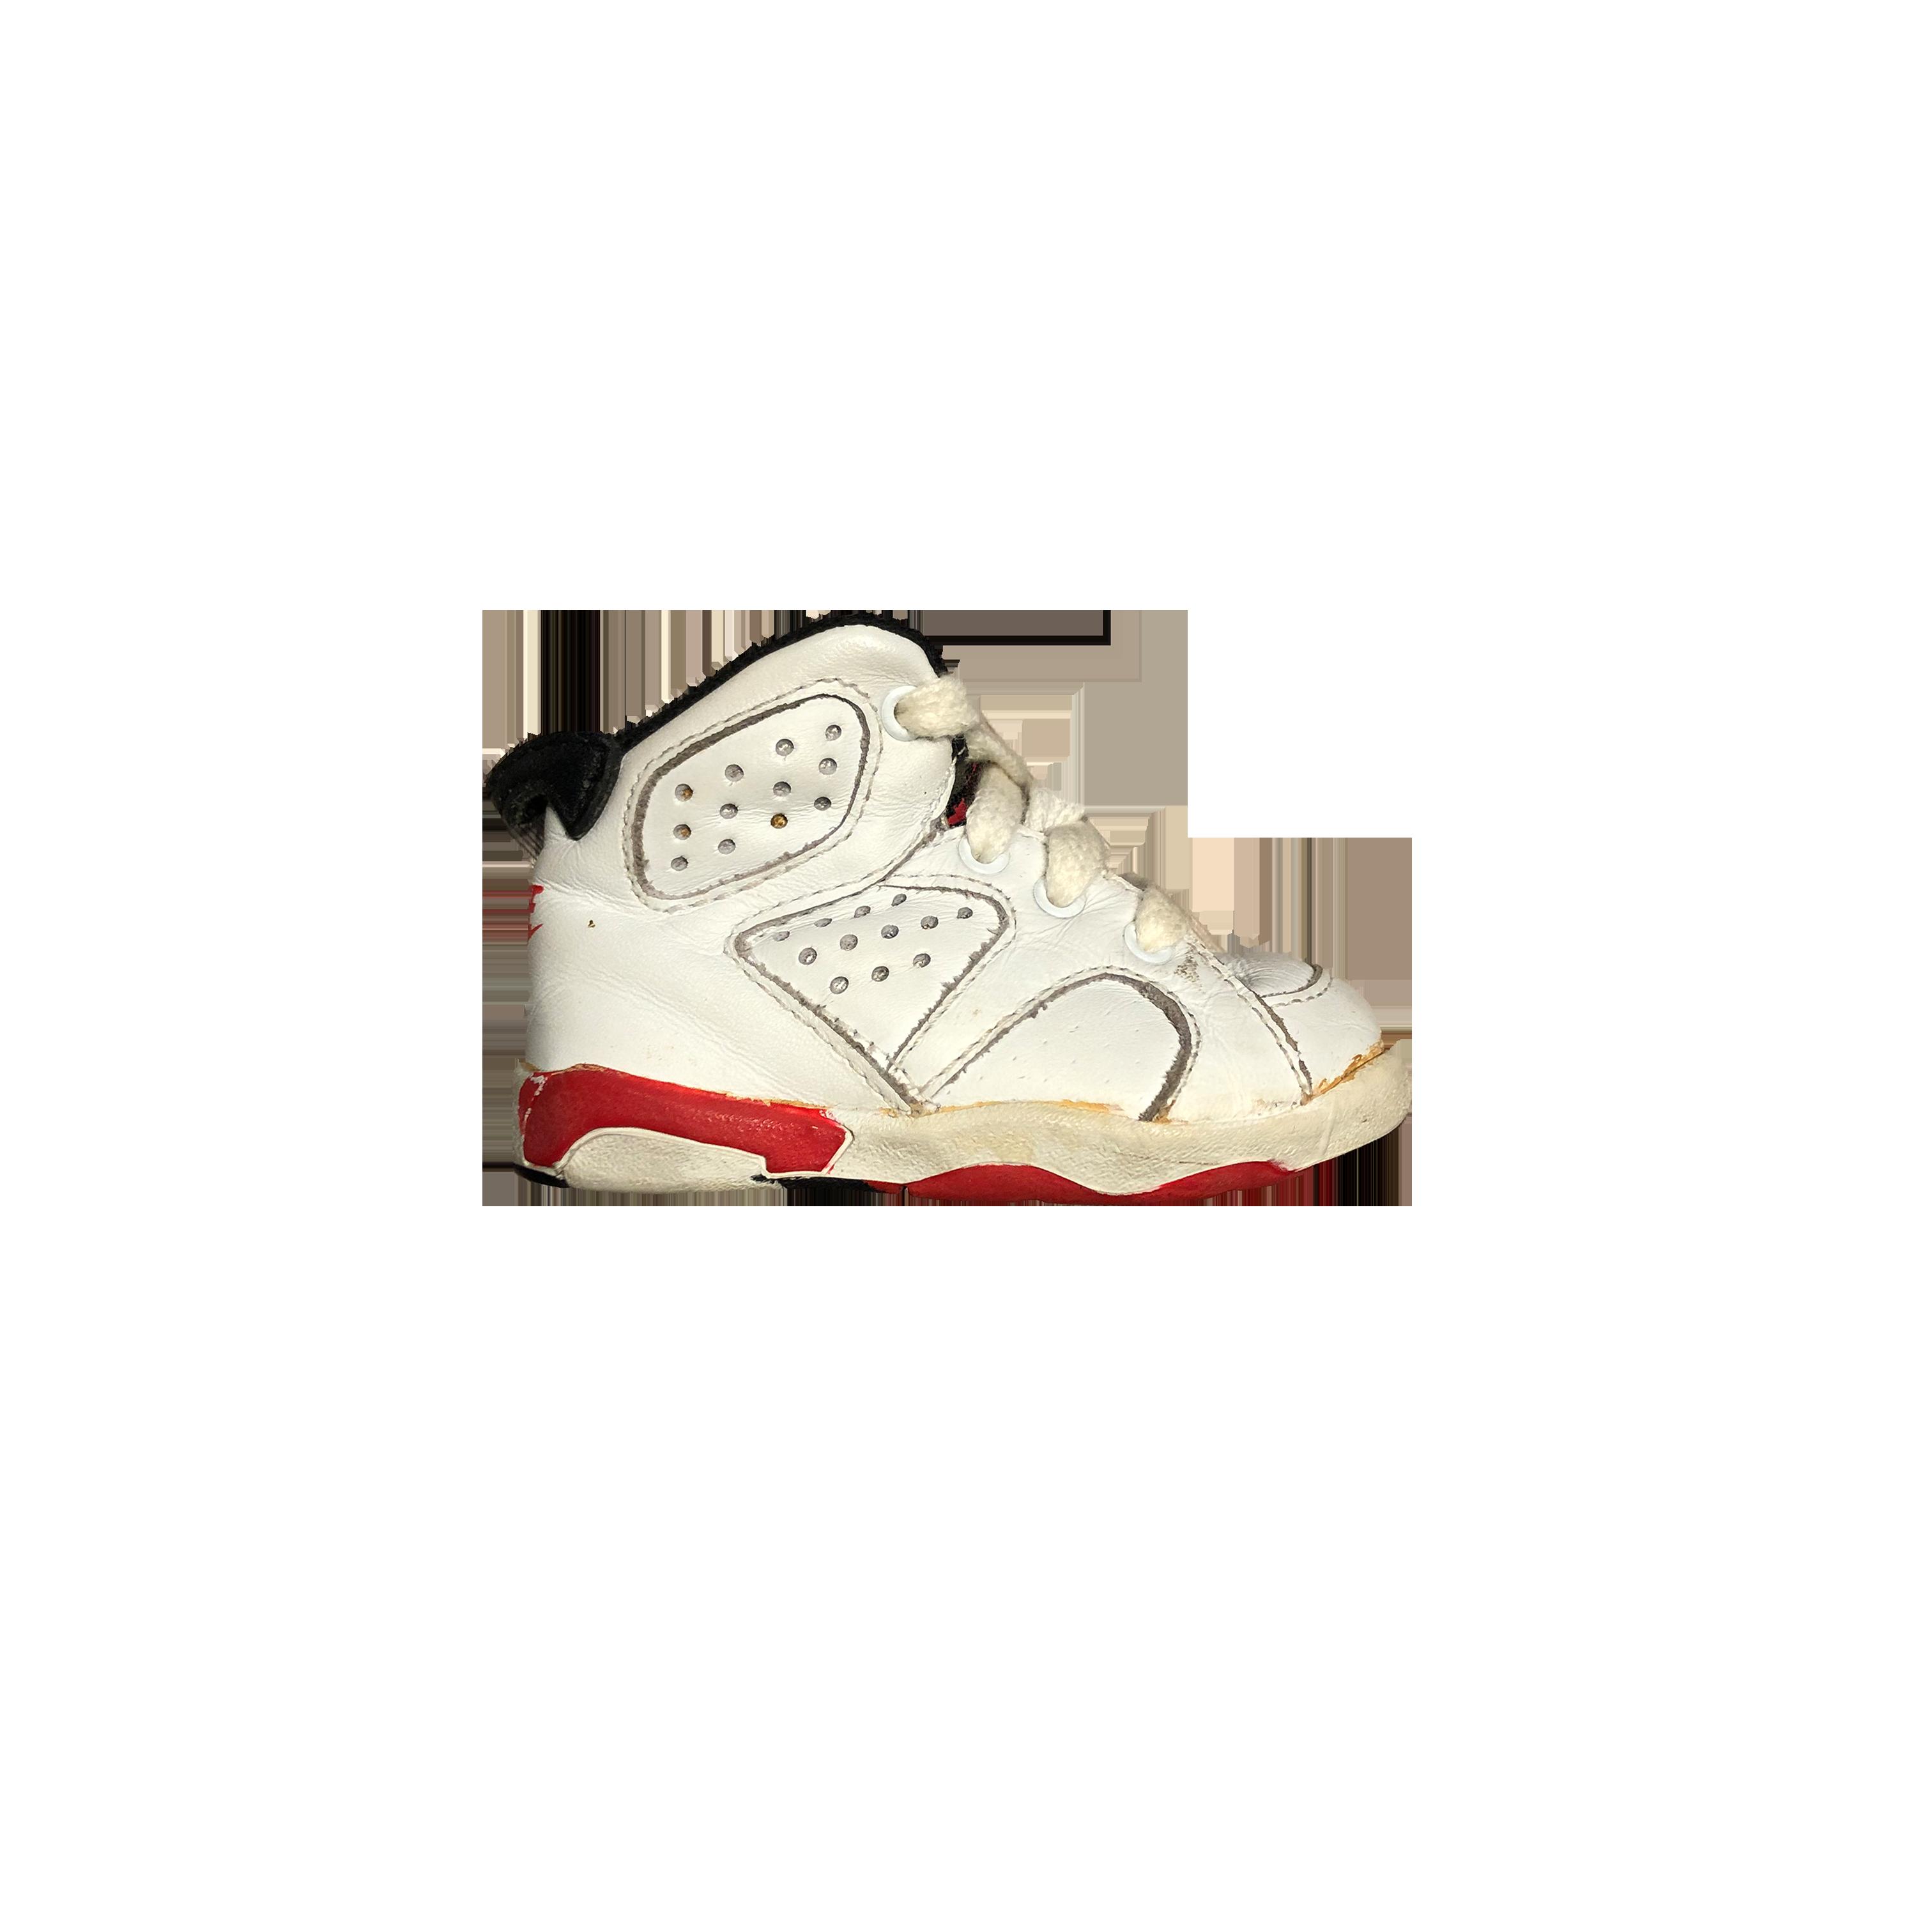 1991 Air Jordan 6 | Size 3 infant